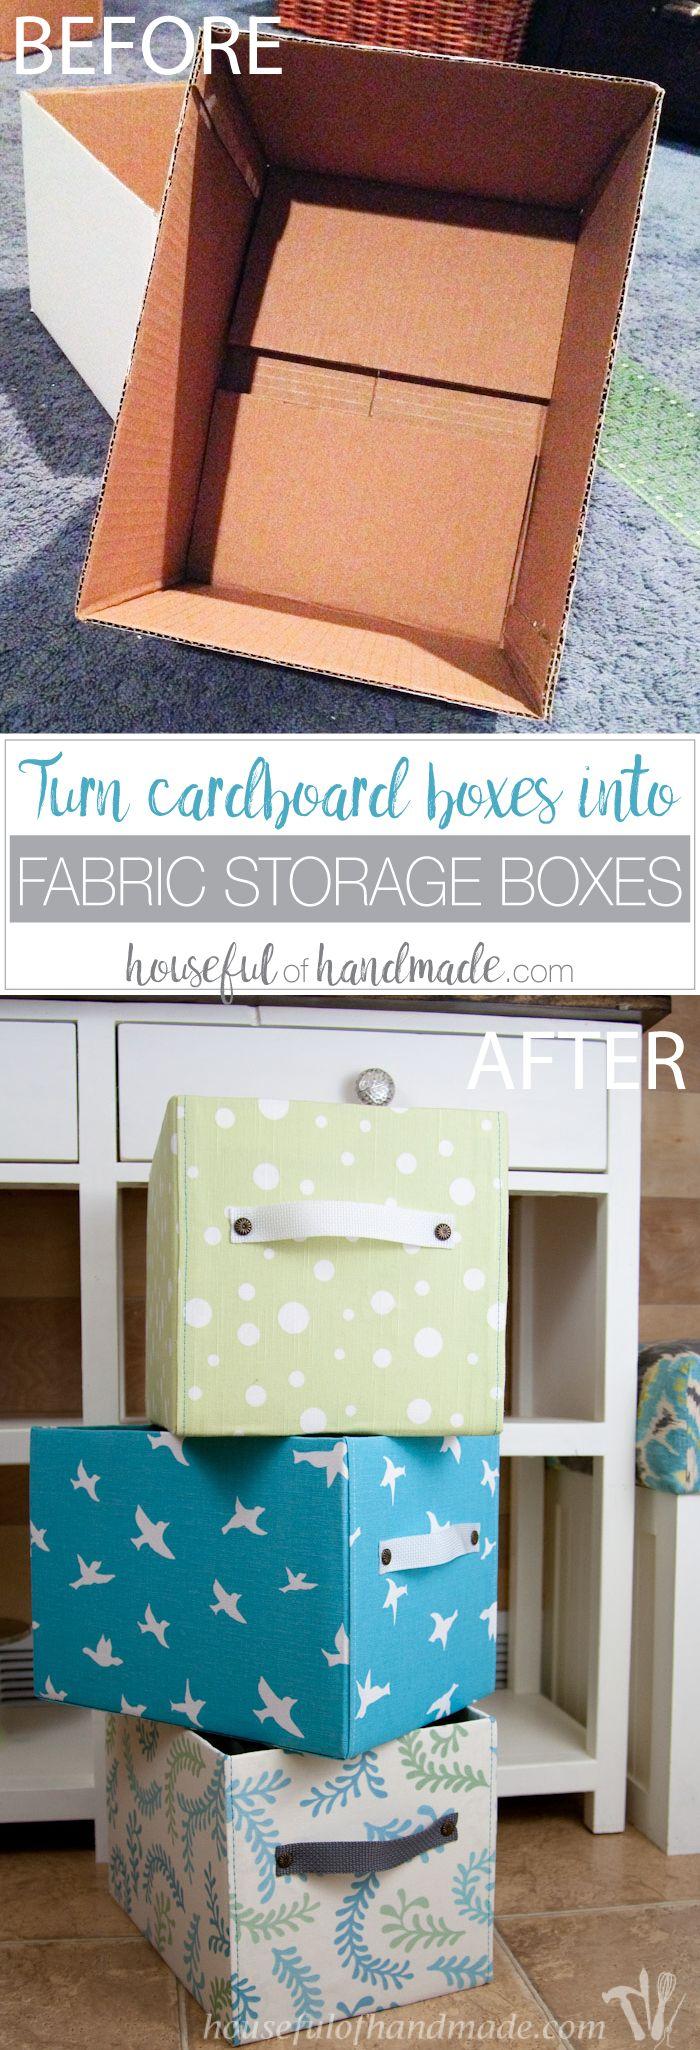 3 Easy Diy Storage Ideas For Small Kitchen: Easy DIY Fabric Storage Boxes